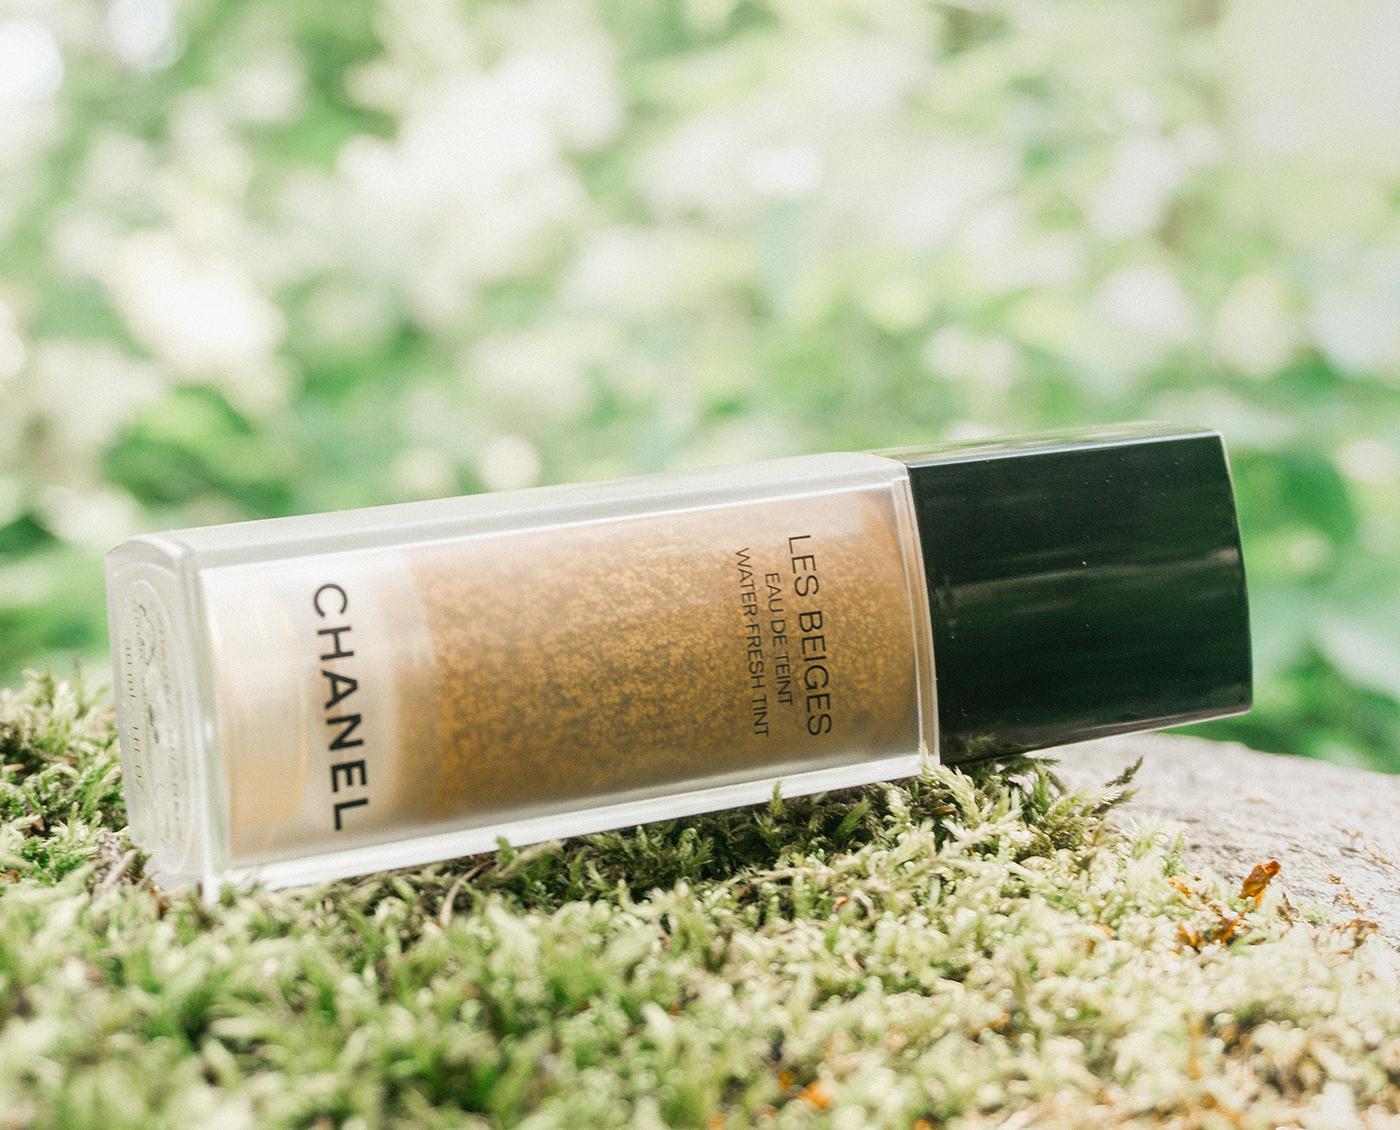 Chanel Les Beiges: Eau de teint laying on green moss